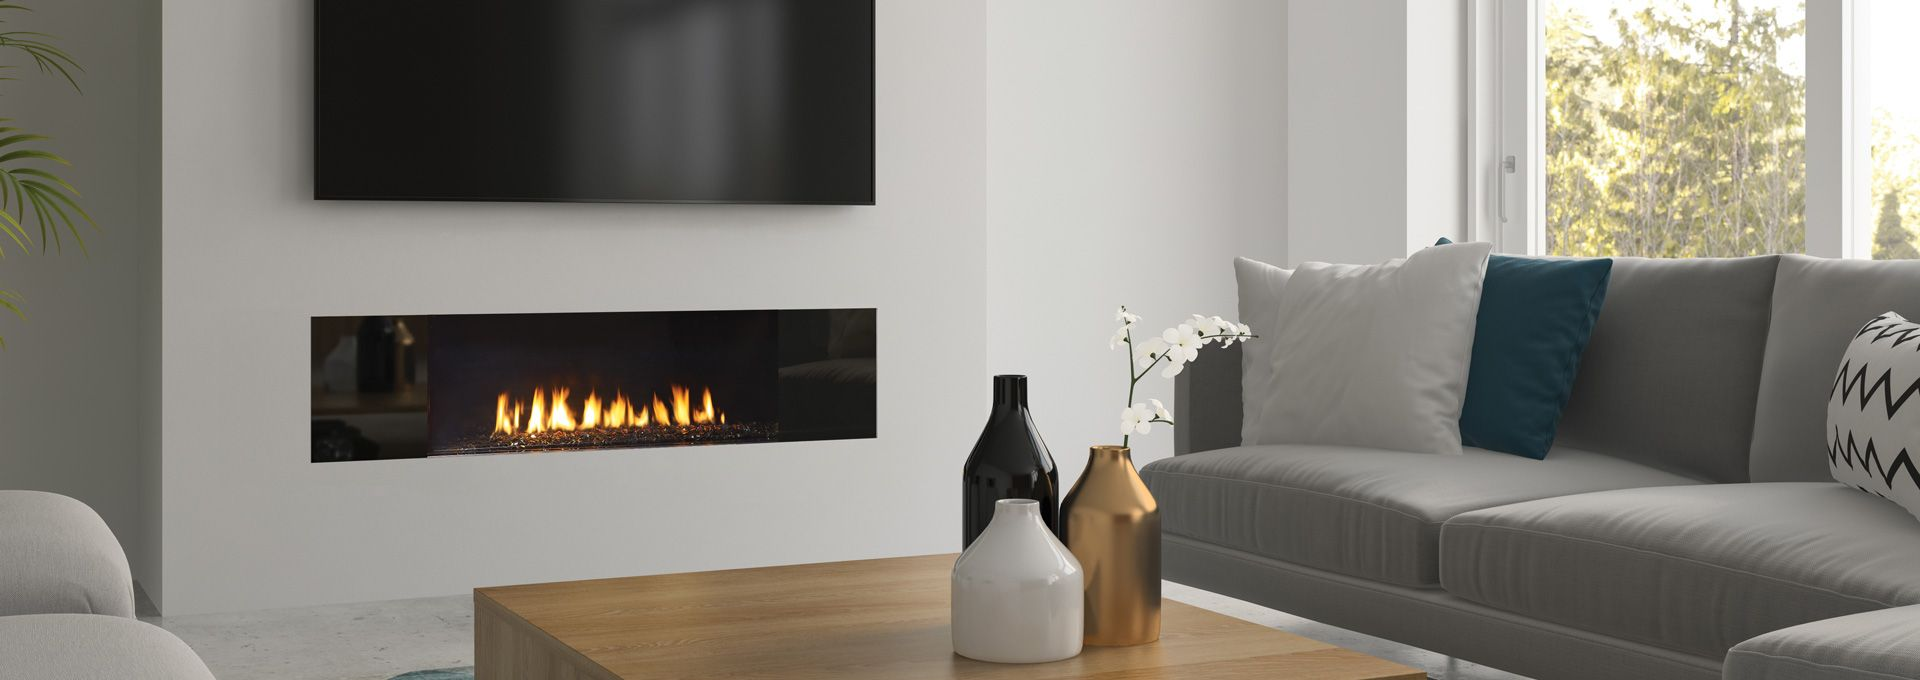 Regency City Series New York View 40 Modern Gas Fireplace Modern